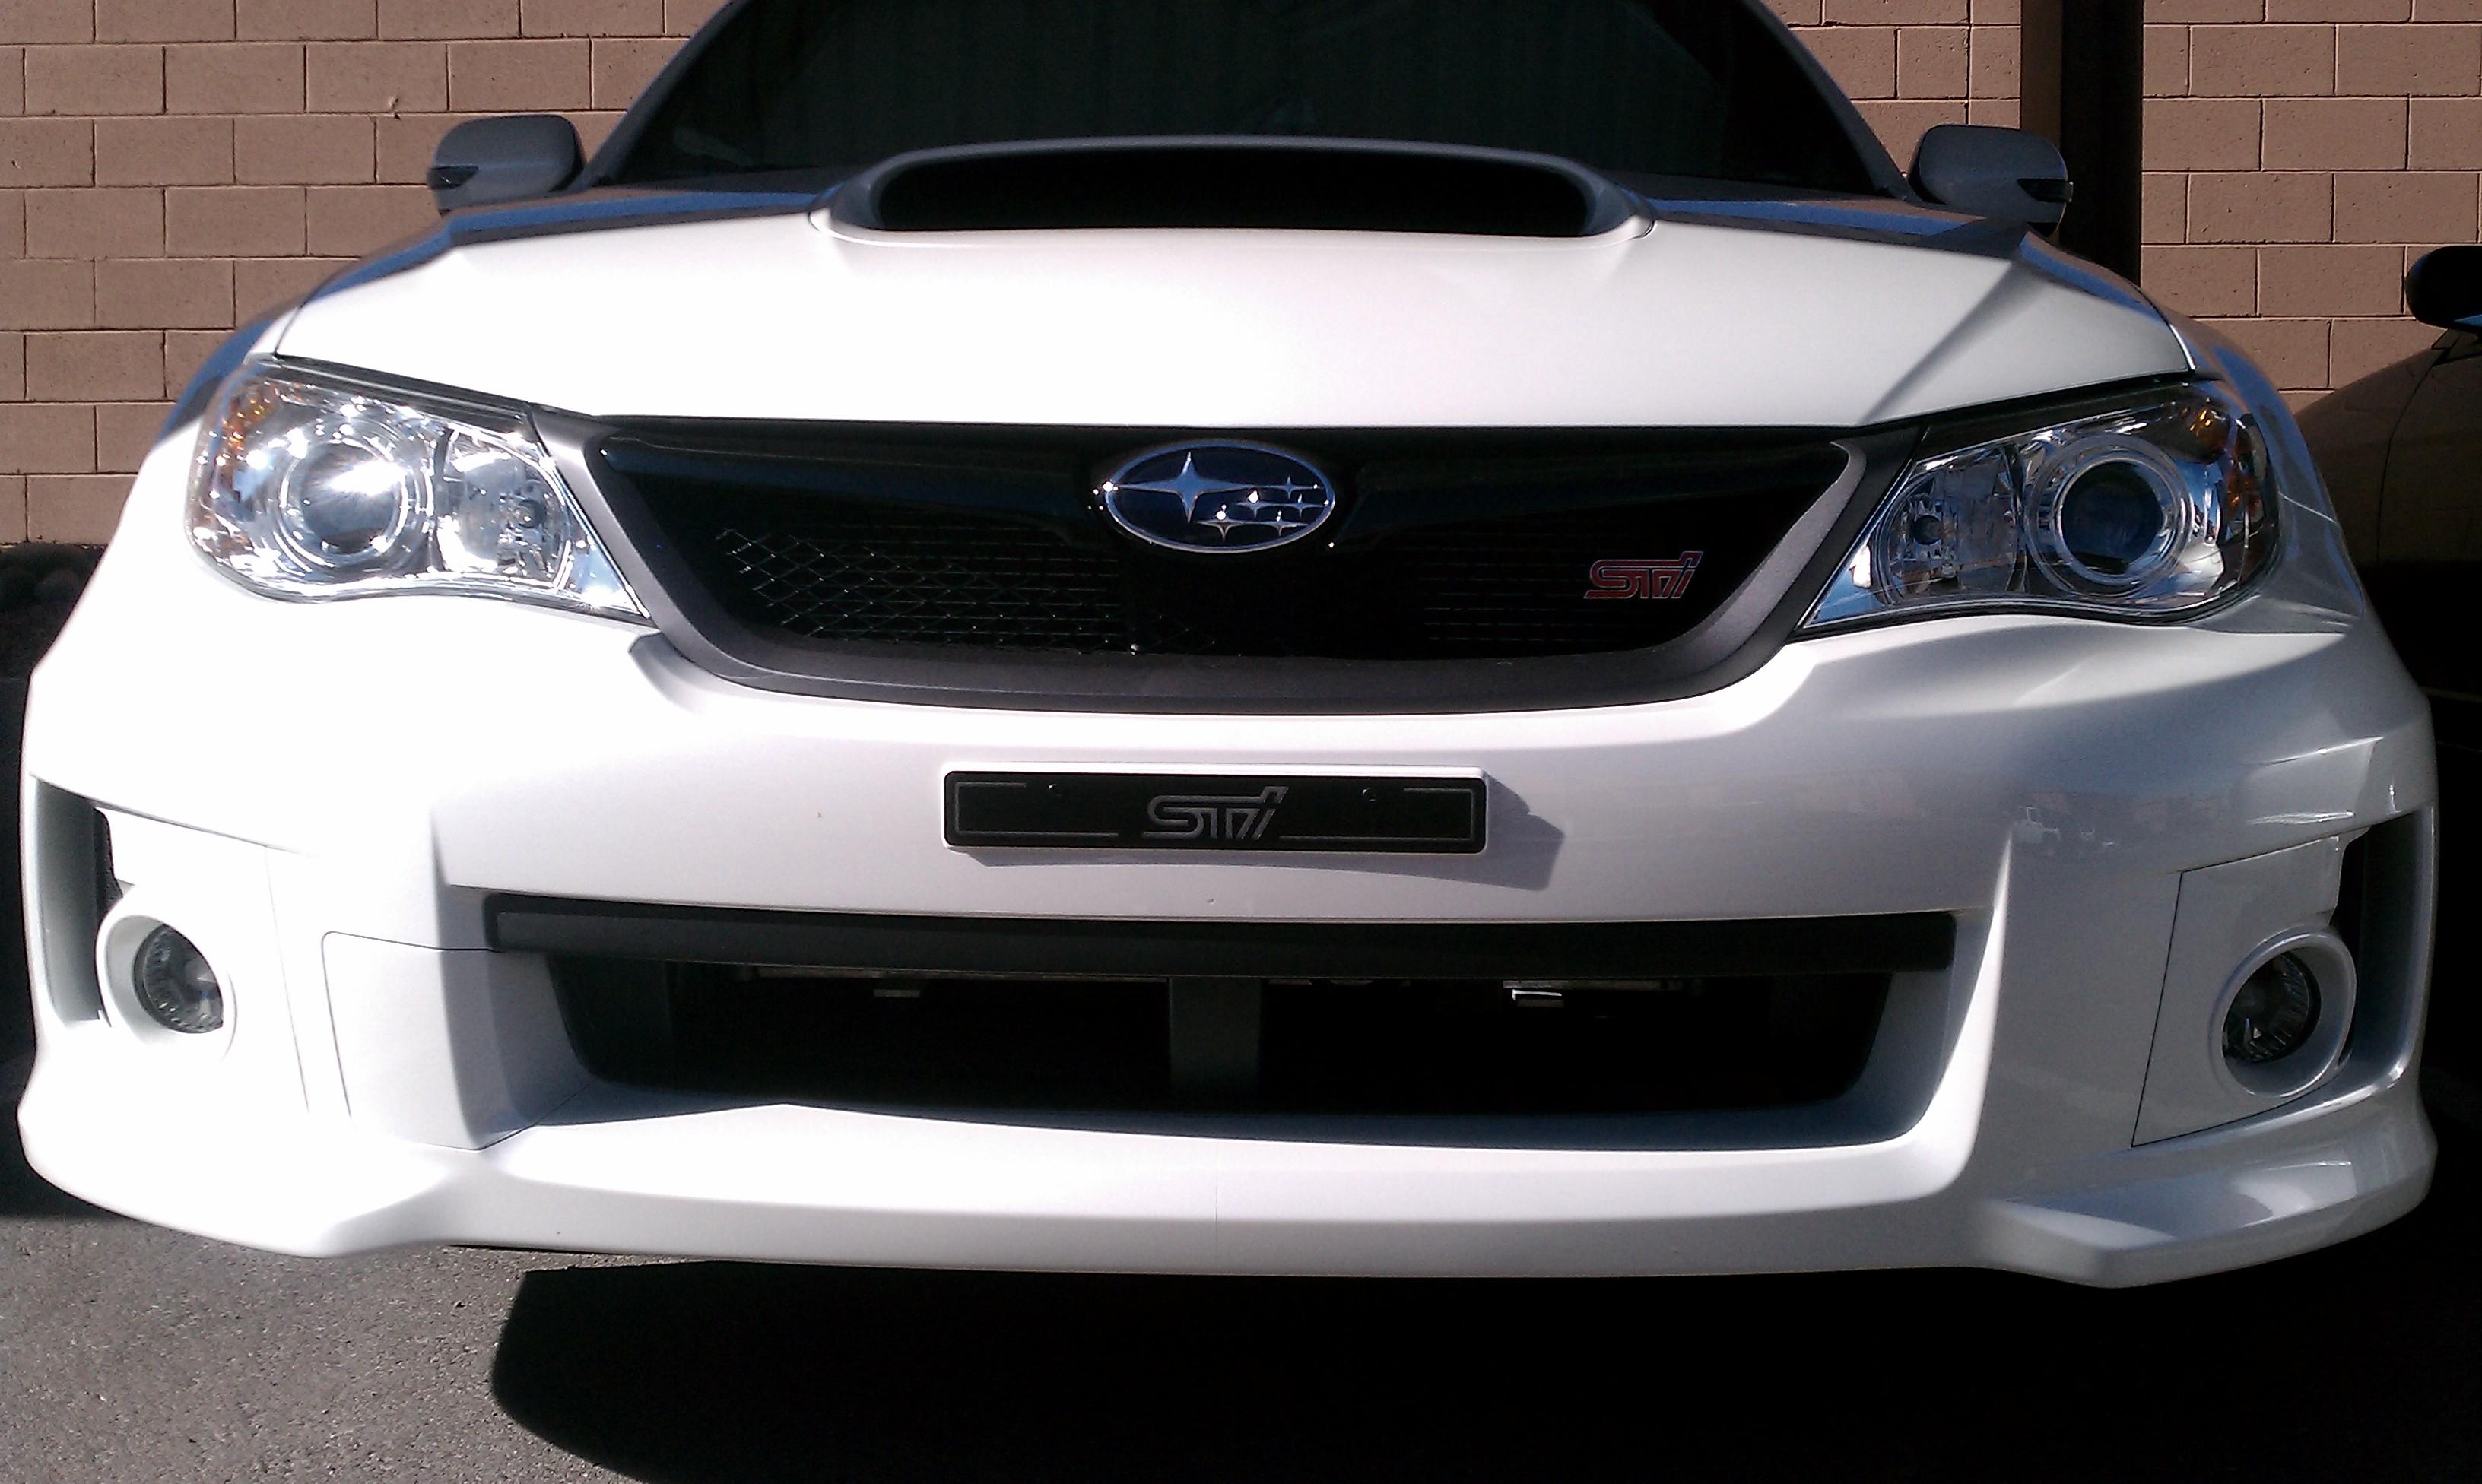 2012 Subaru STi, 41,xxx miles, Garage Baby, One Owner, Asking .9k-front-jpg